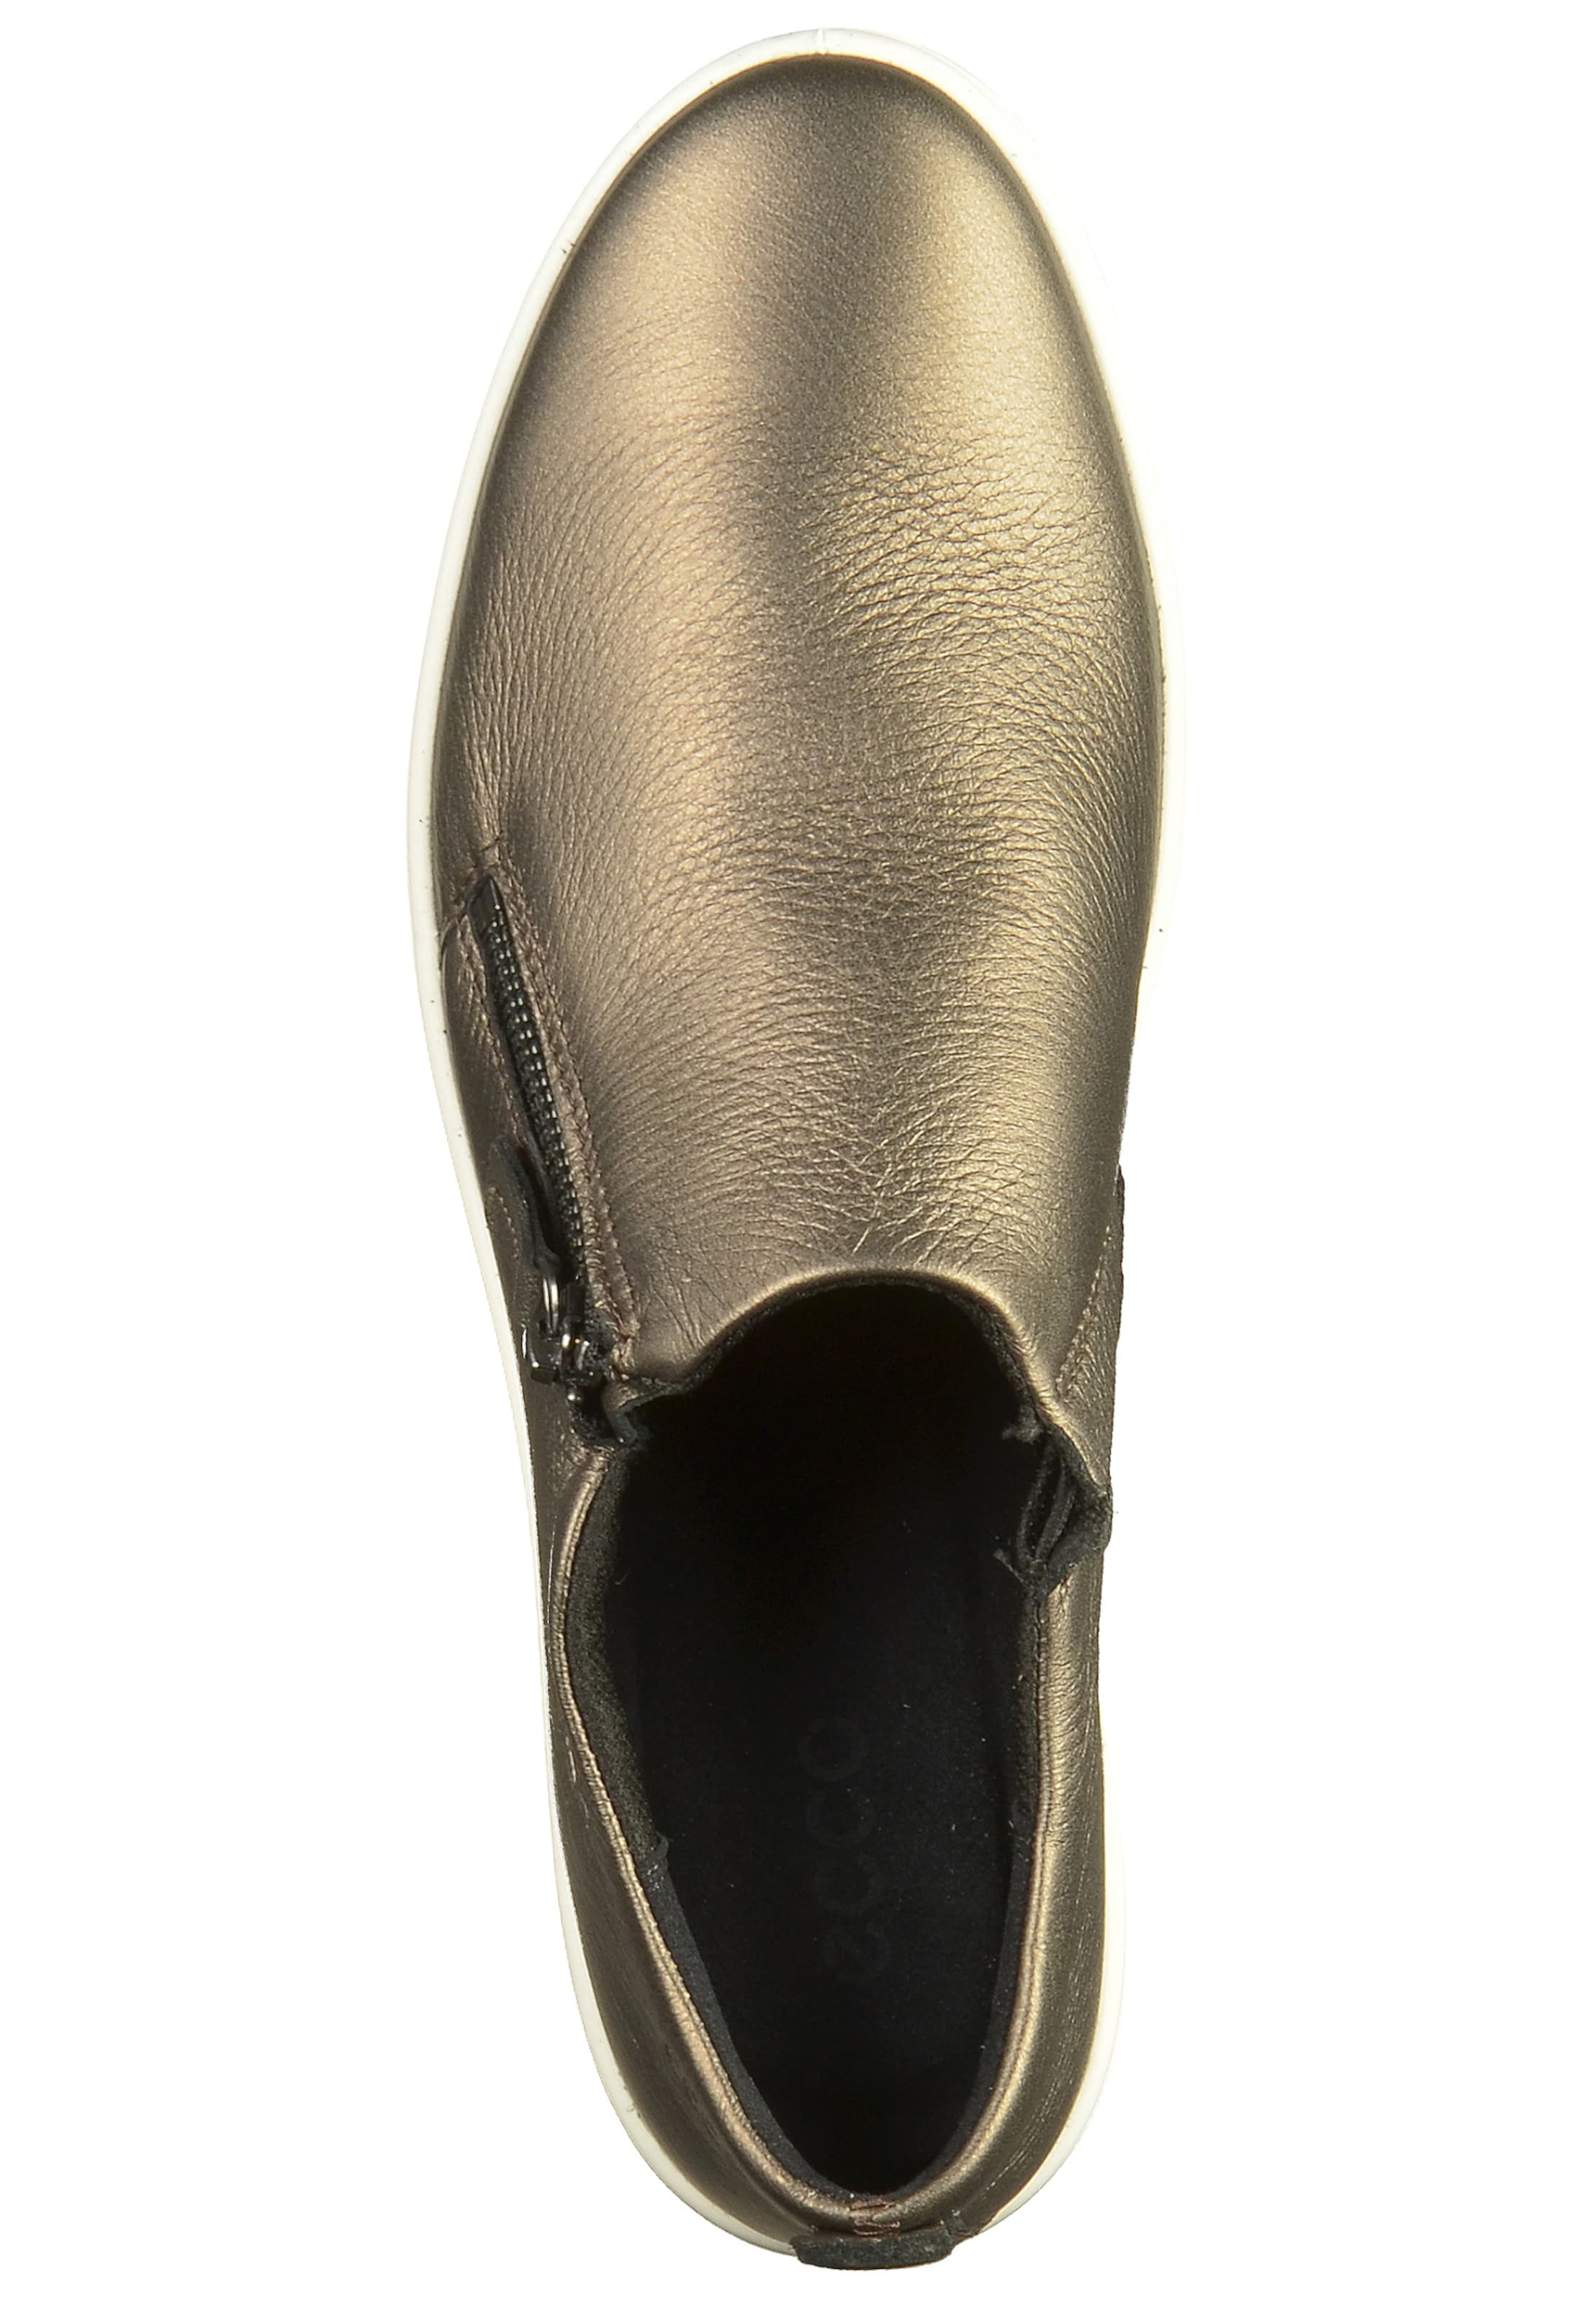 Chaussons Bronze En Bronze Ecco Chaussons En Chaussons Ecco Ecco SMzUVp